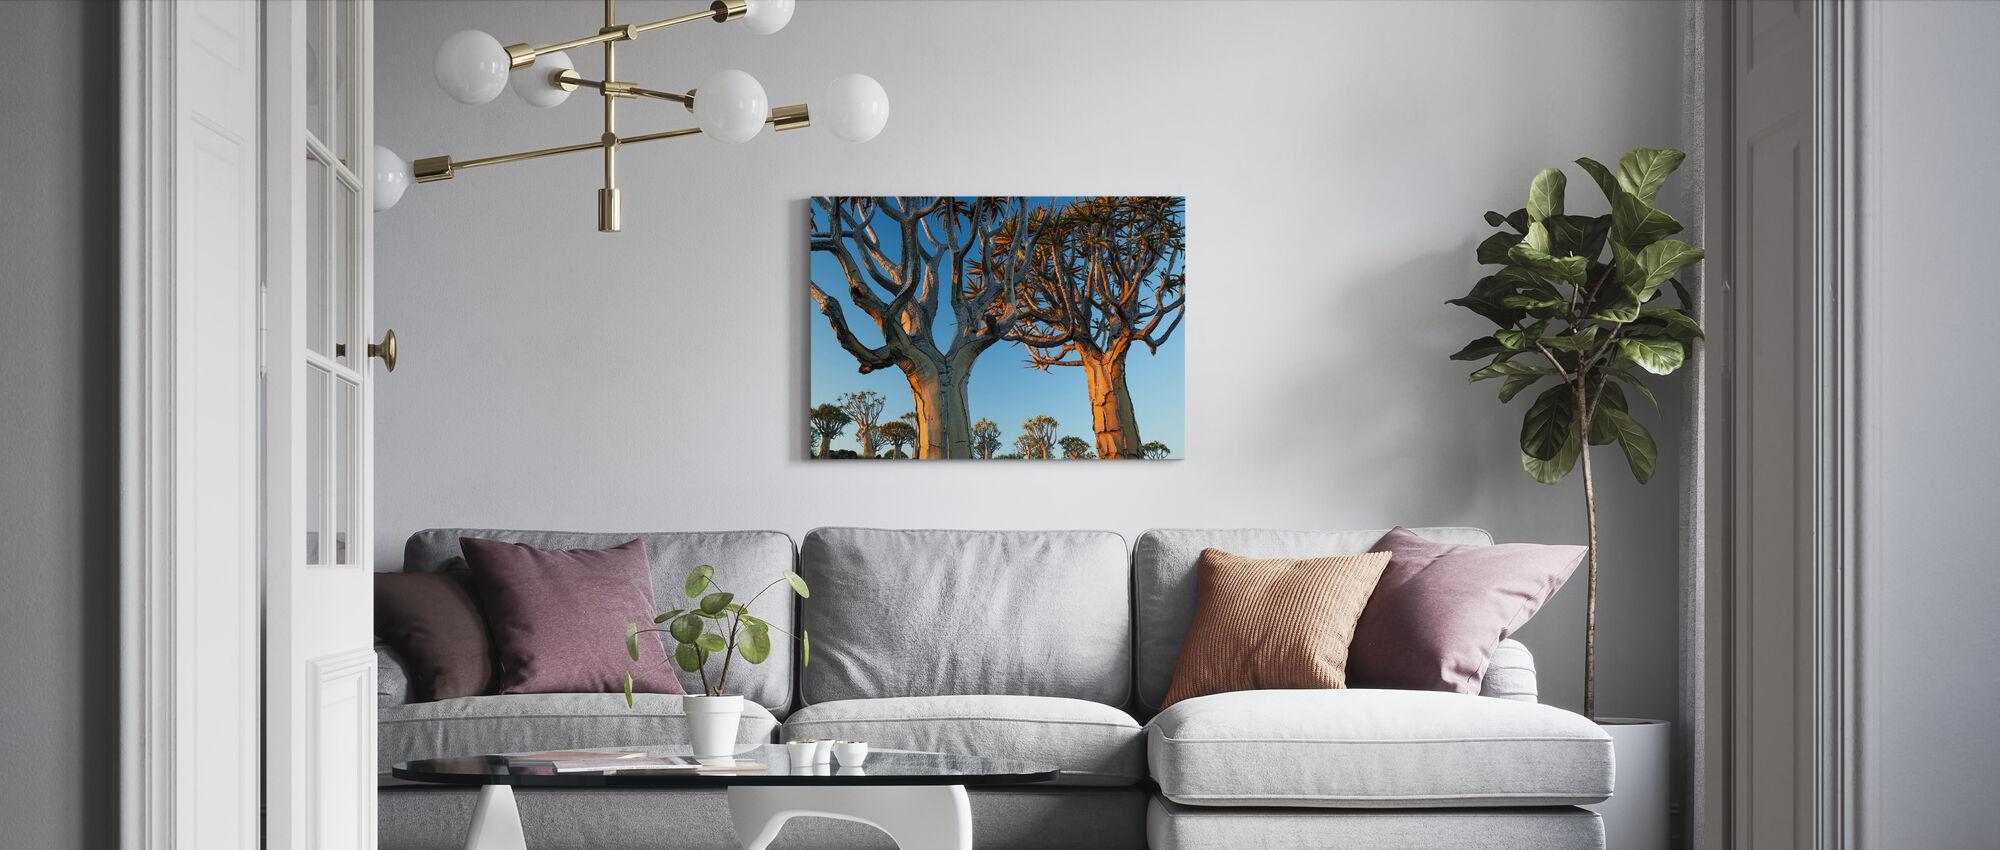 Kijpbomen in Namib woestijn - Canvas print - Woonkamer